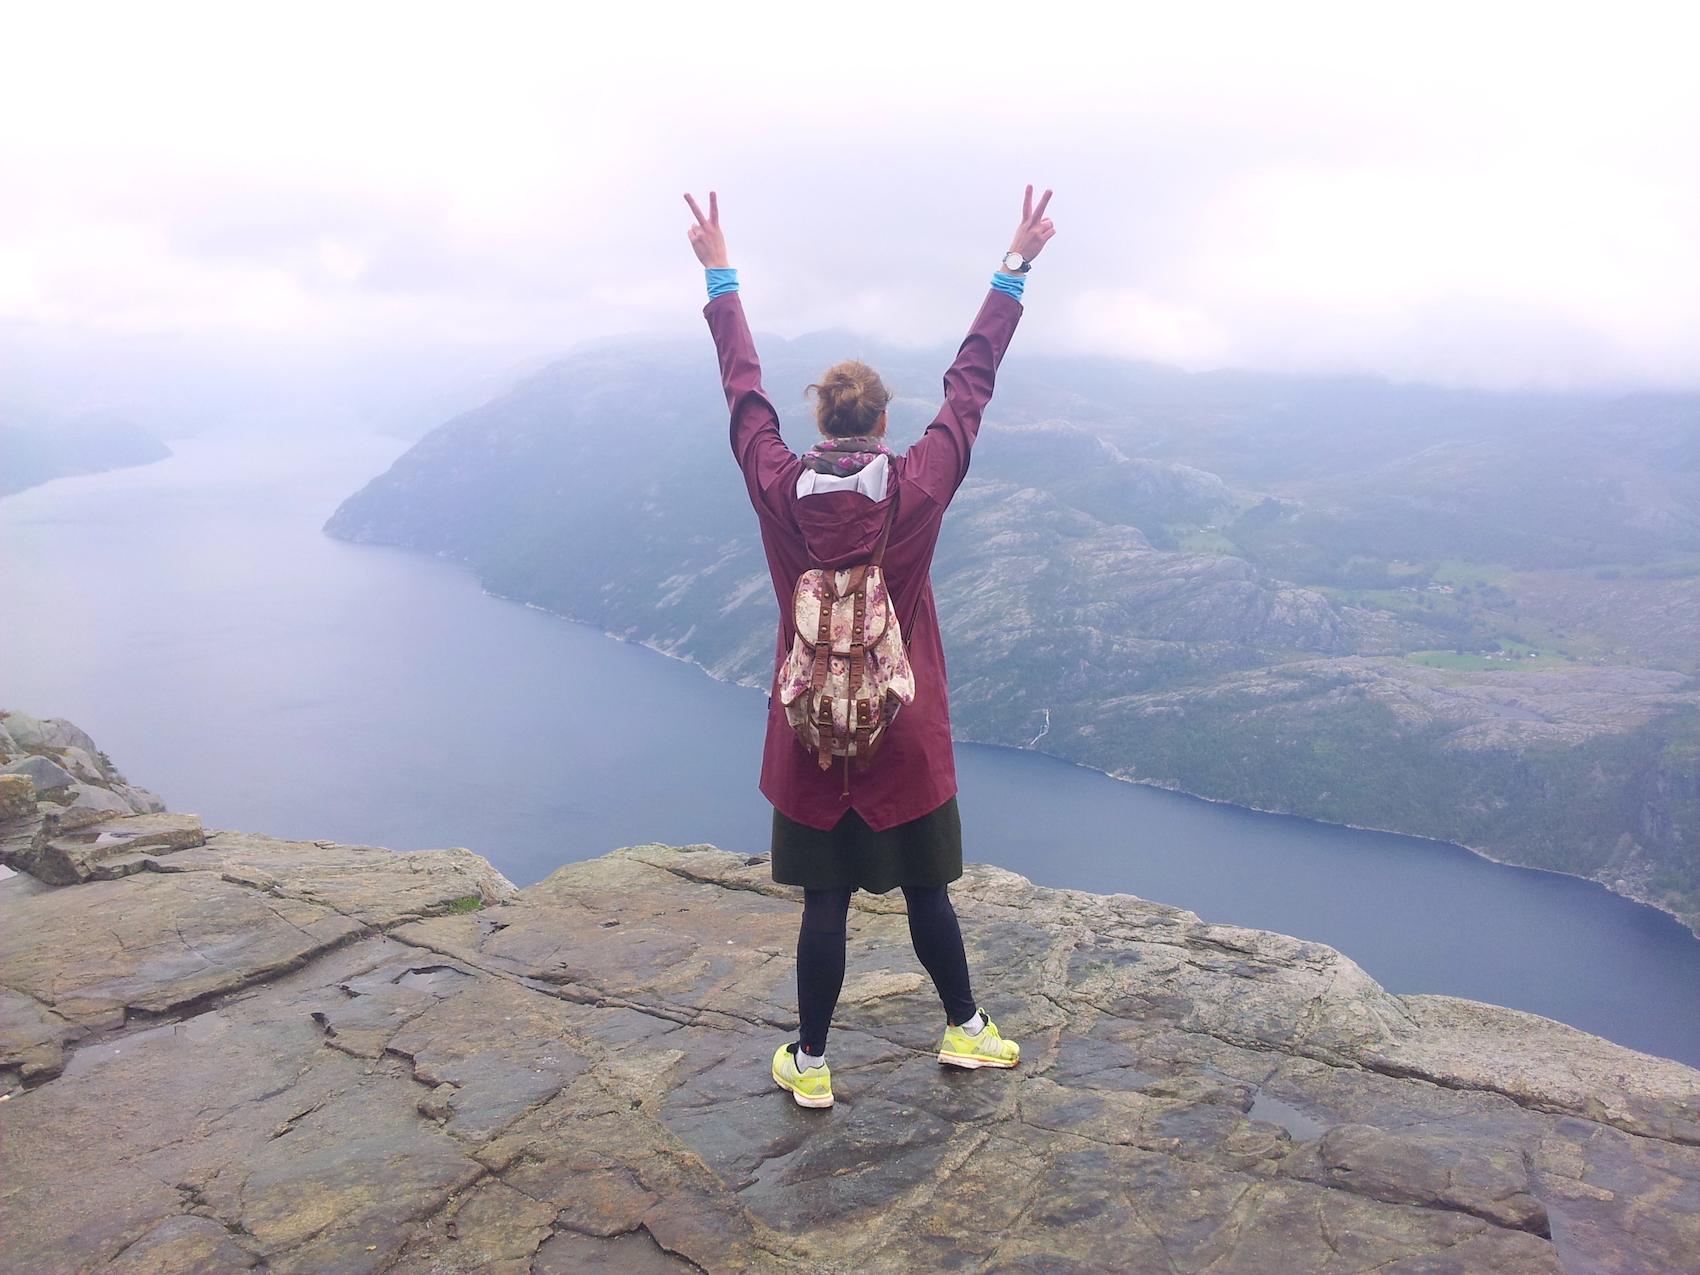 Norway, Scandinavia, Itinerary, Preikestolen